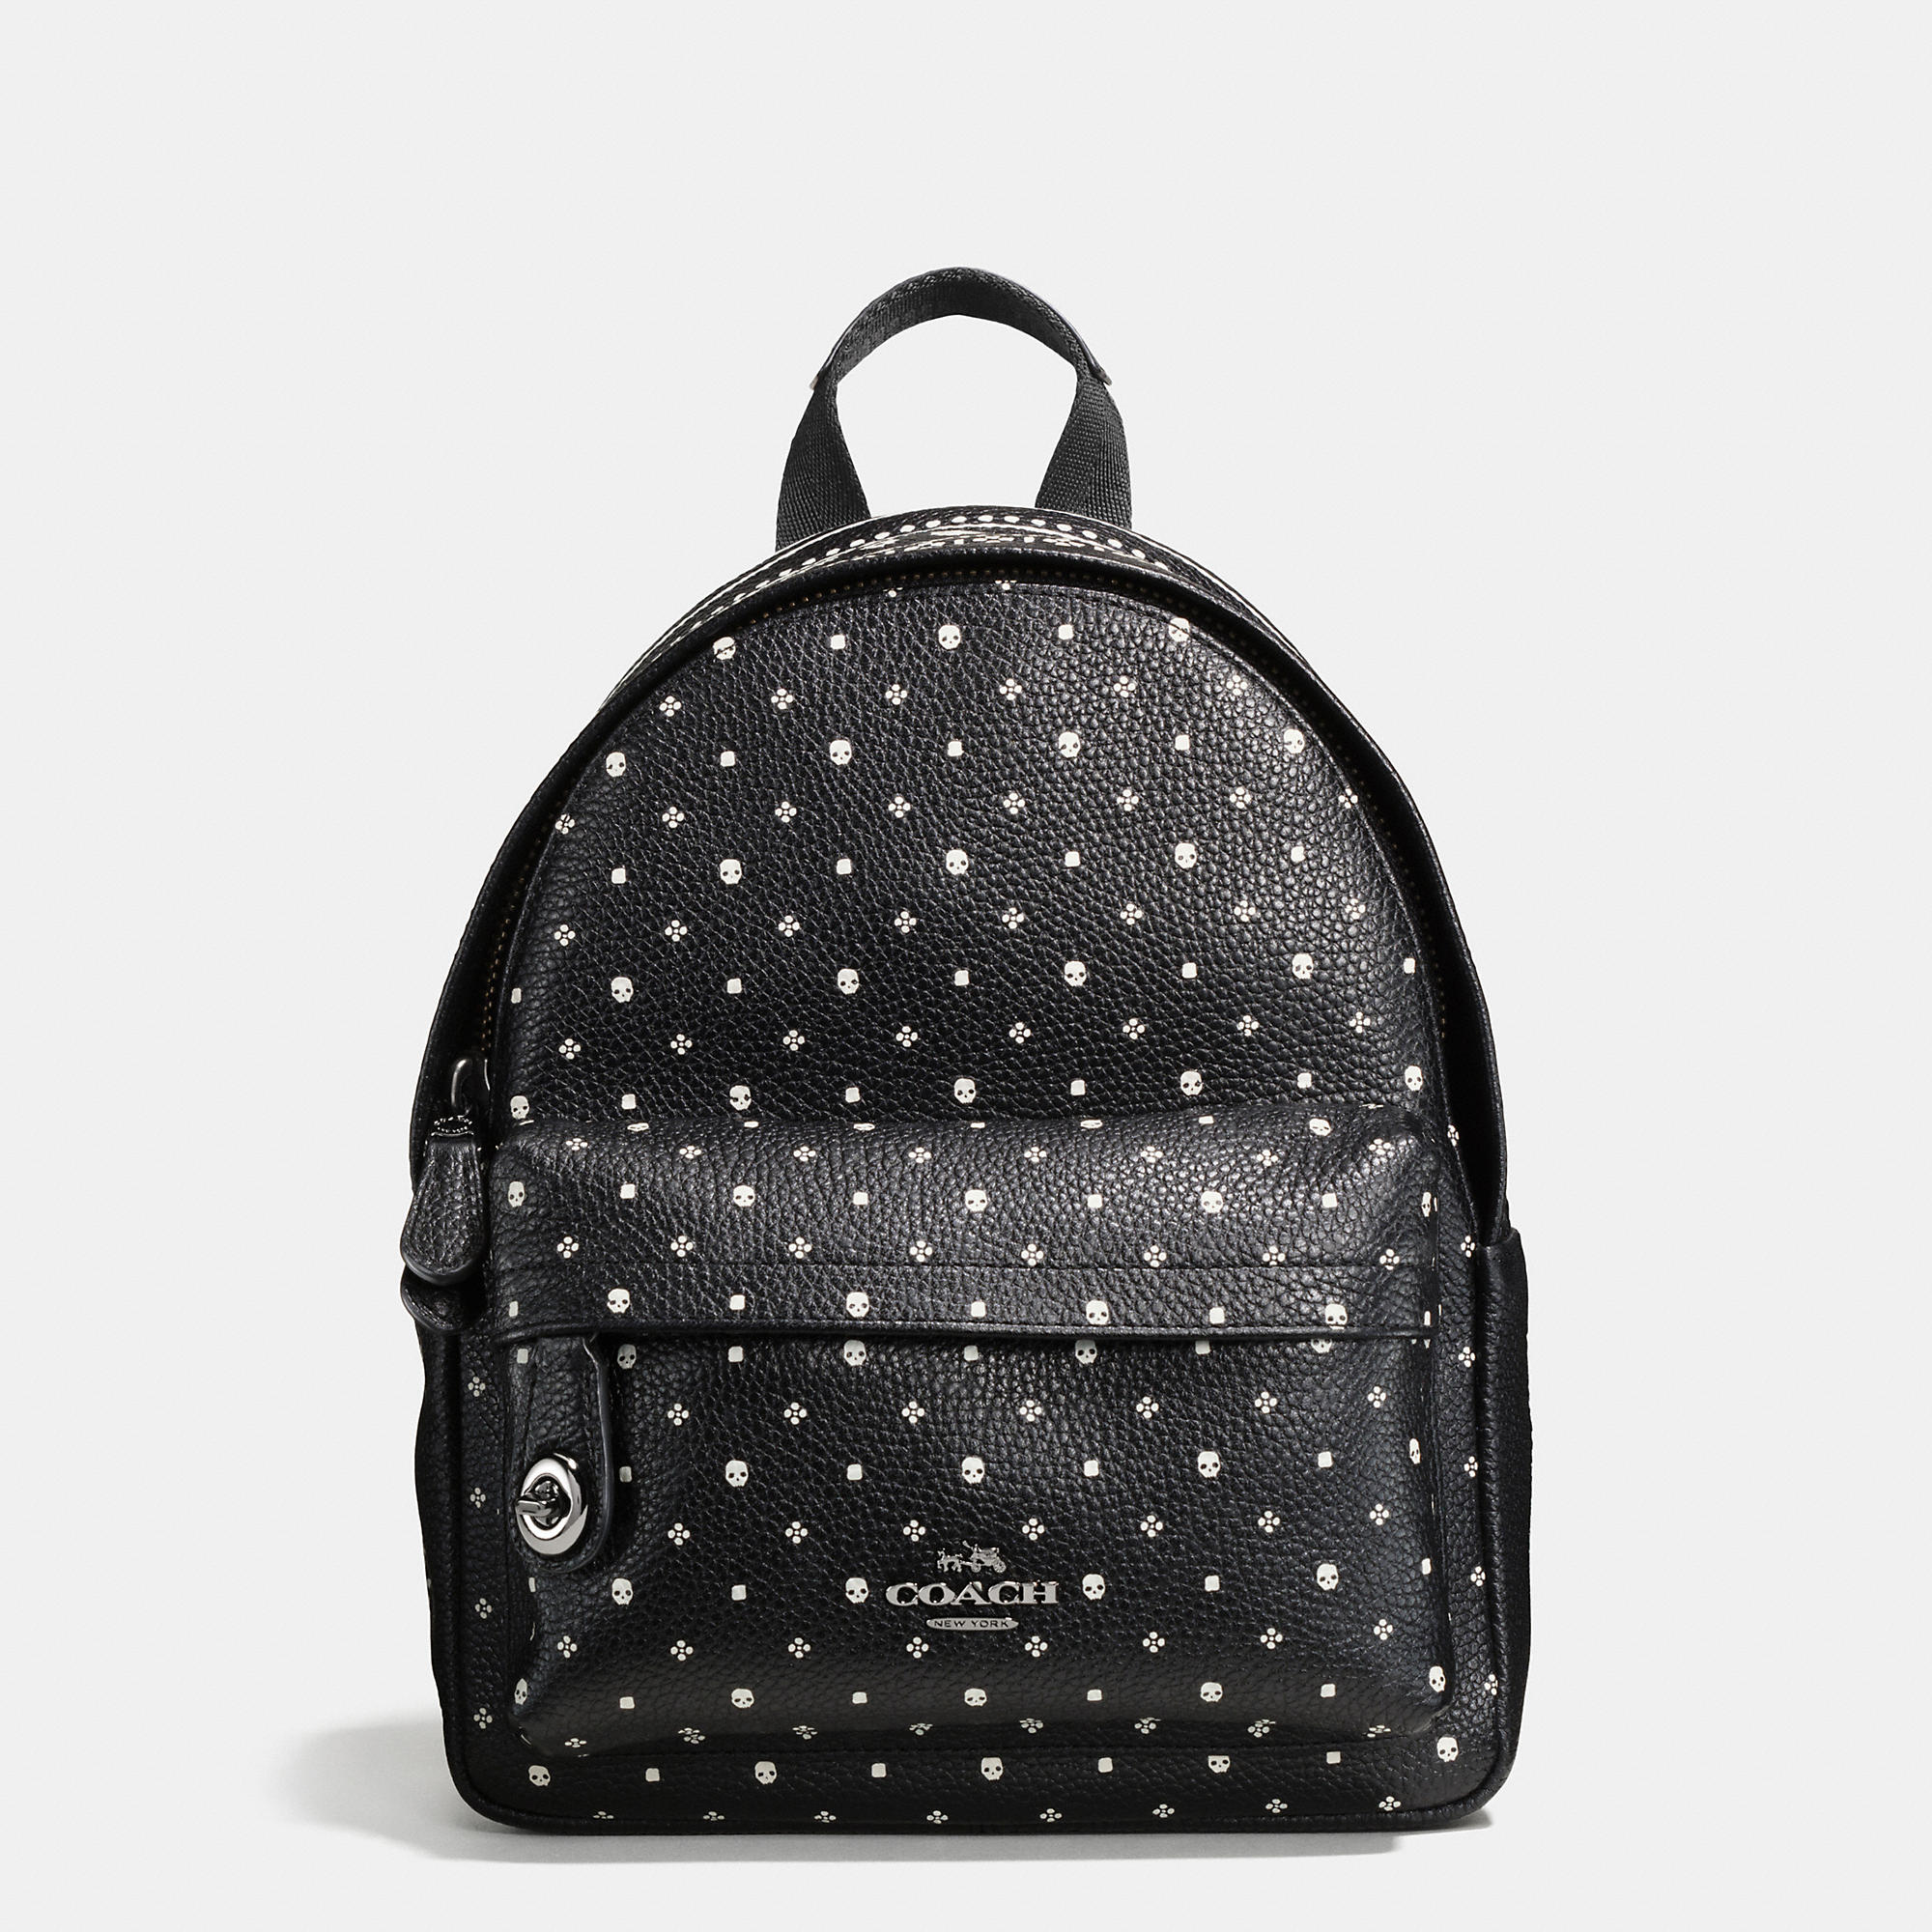 Coach Mini Campus Backpack In Bandana Print Leather